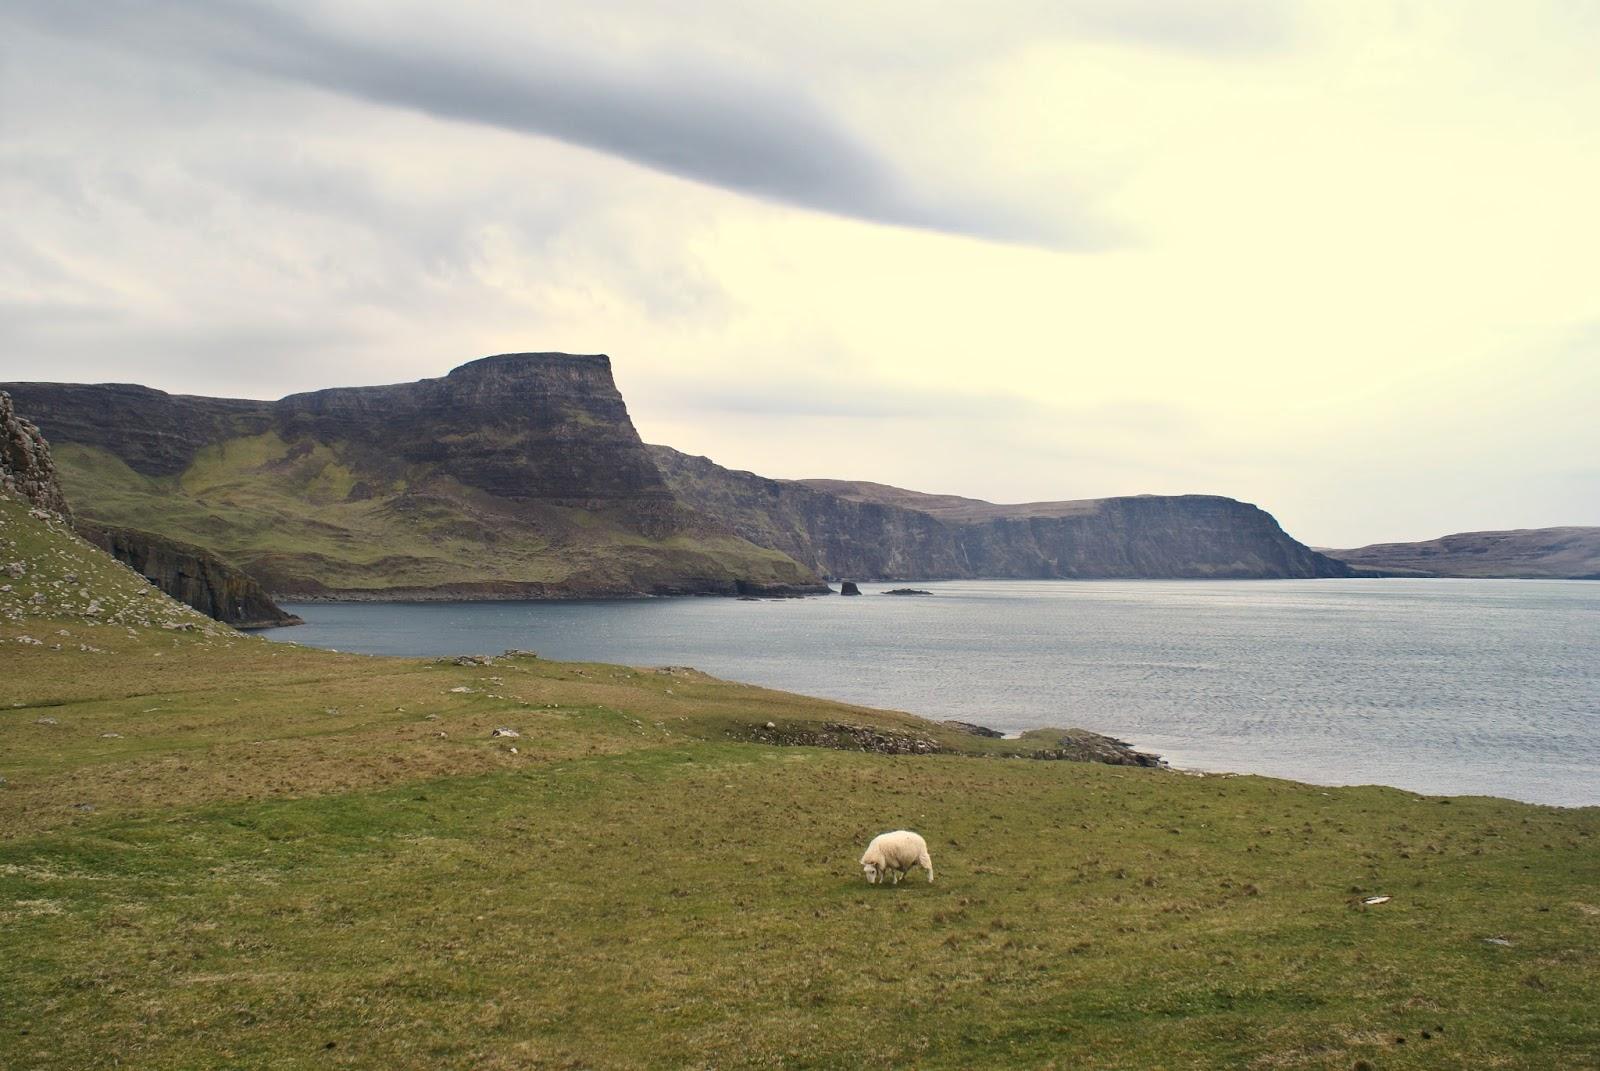 waterstein head neist point skye scotland alba uk united kingdom